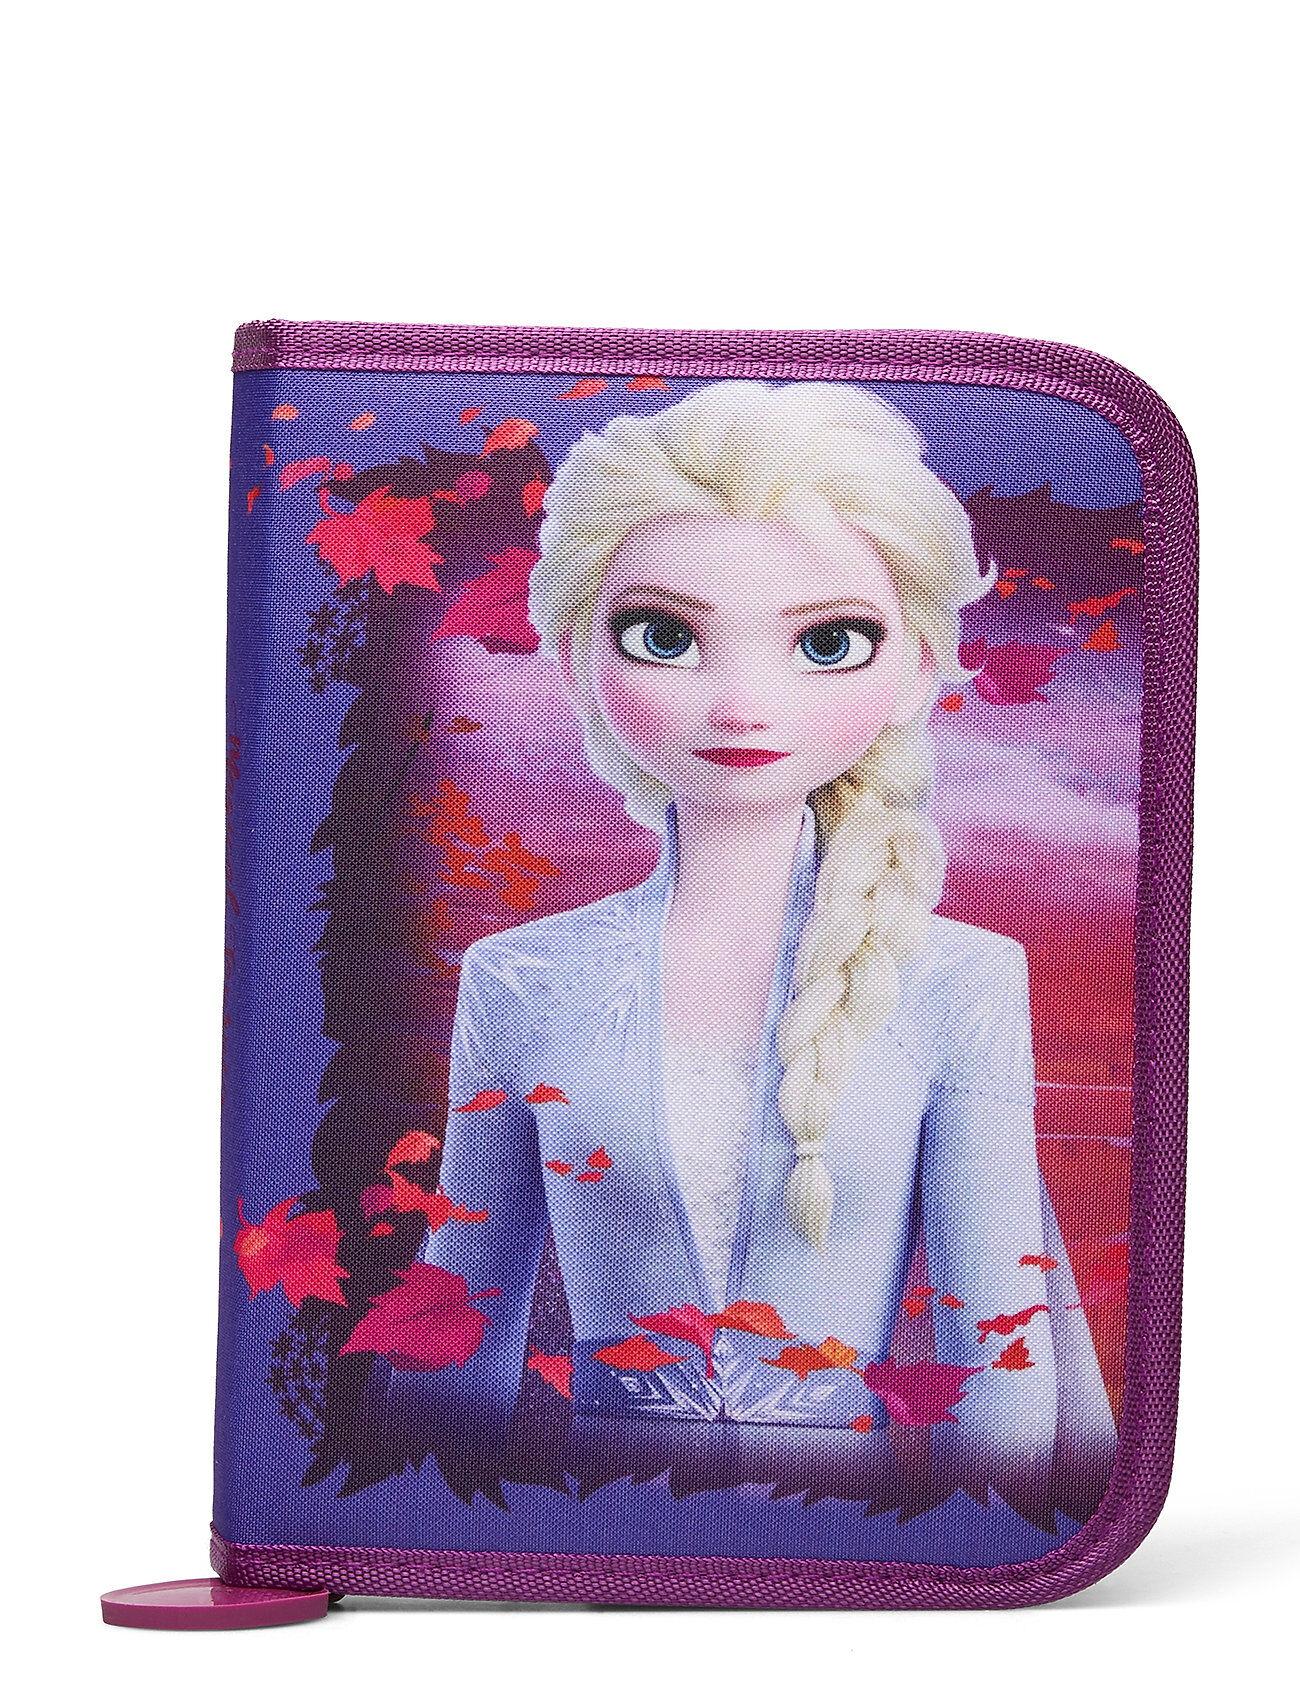 Disney Frozen 2 Filled Single Decker Accessories Bags Pencil Cases Liila Disney Frozen